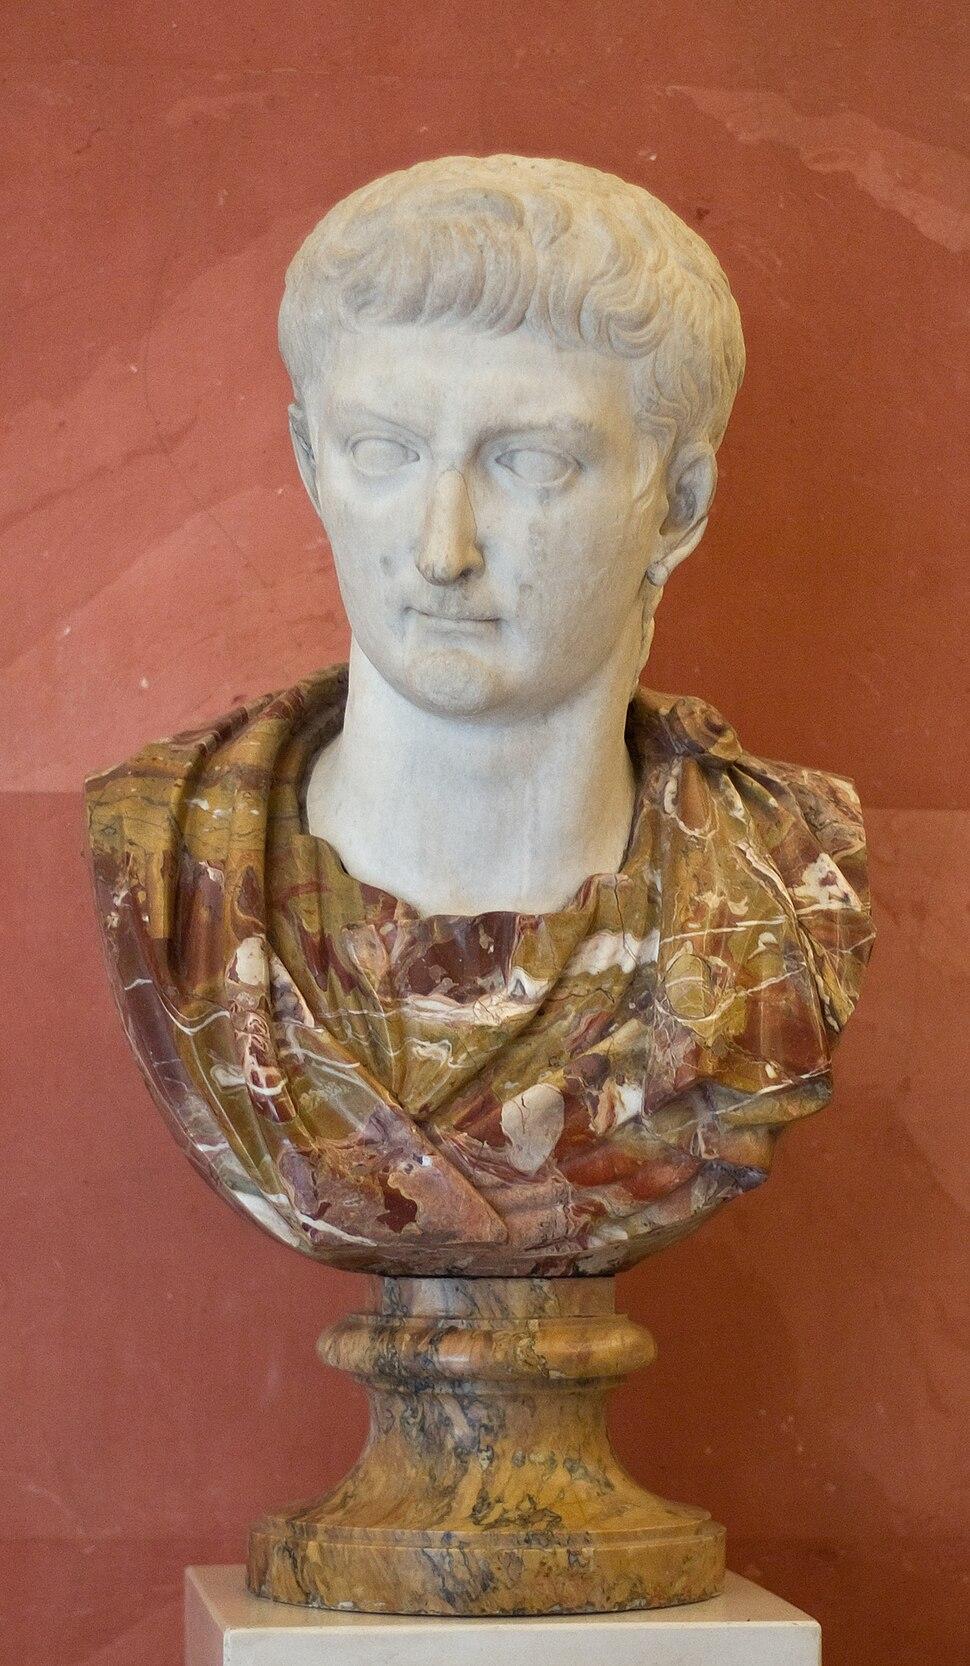 Portrait of Tiberius - Портрет Тиберия A54, 1